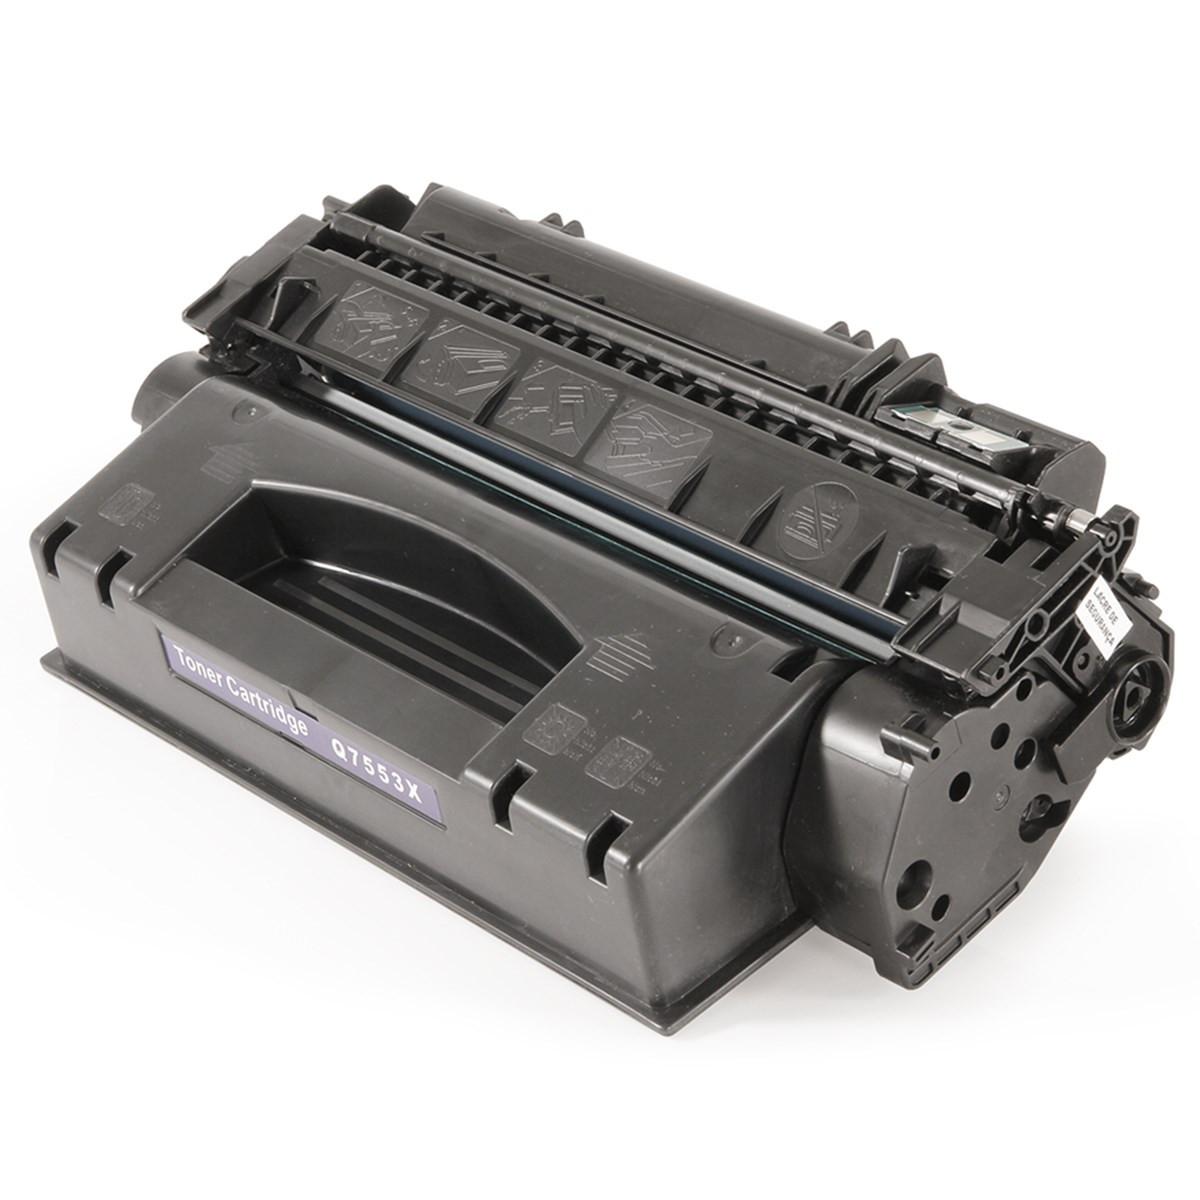 Toner Compatível com HP Q7553X Q7553XB | 2014 2014N 2015 2015N P2014 P2015 M2727 | Premium 5k